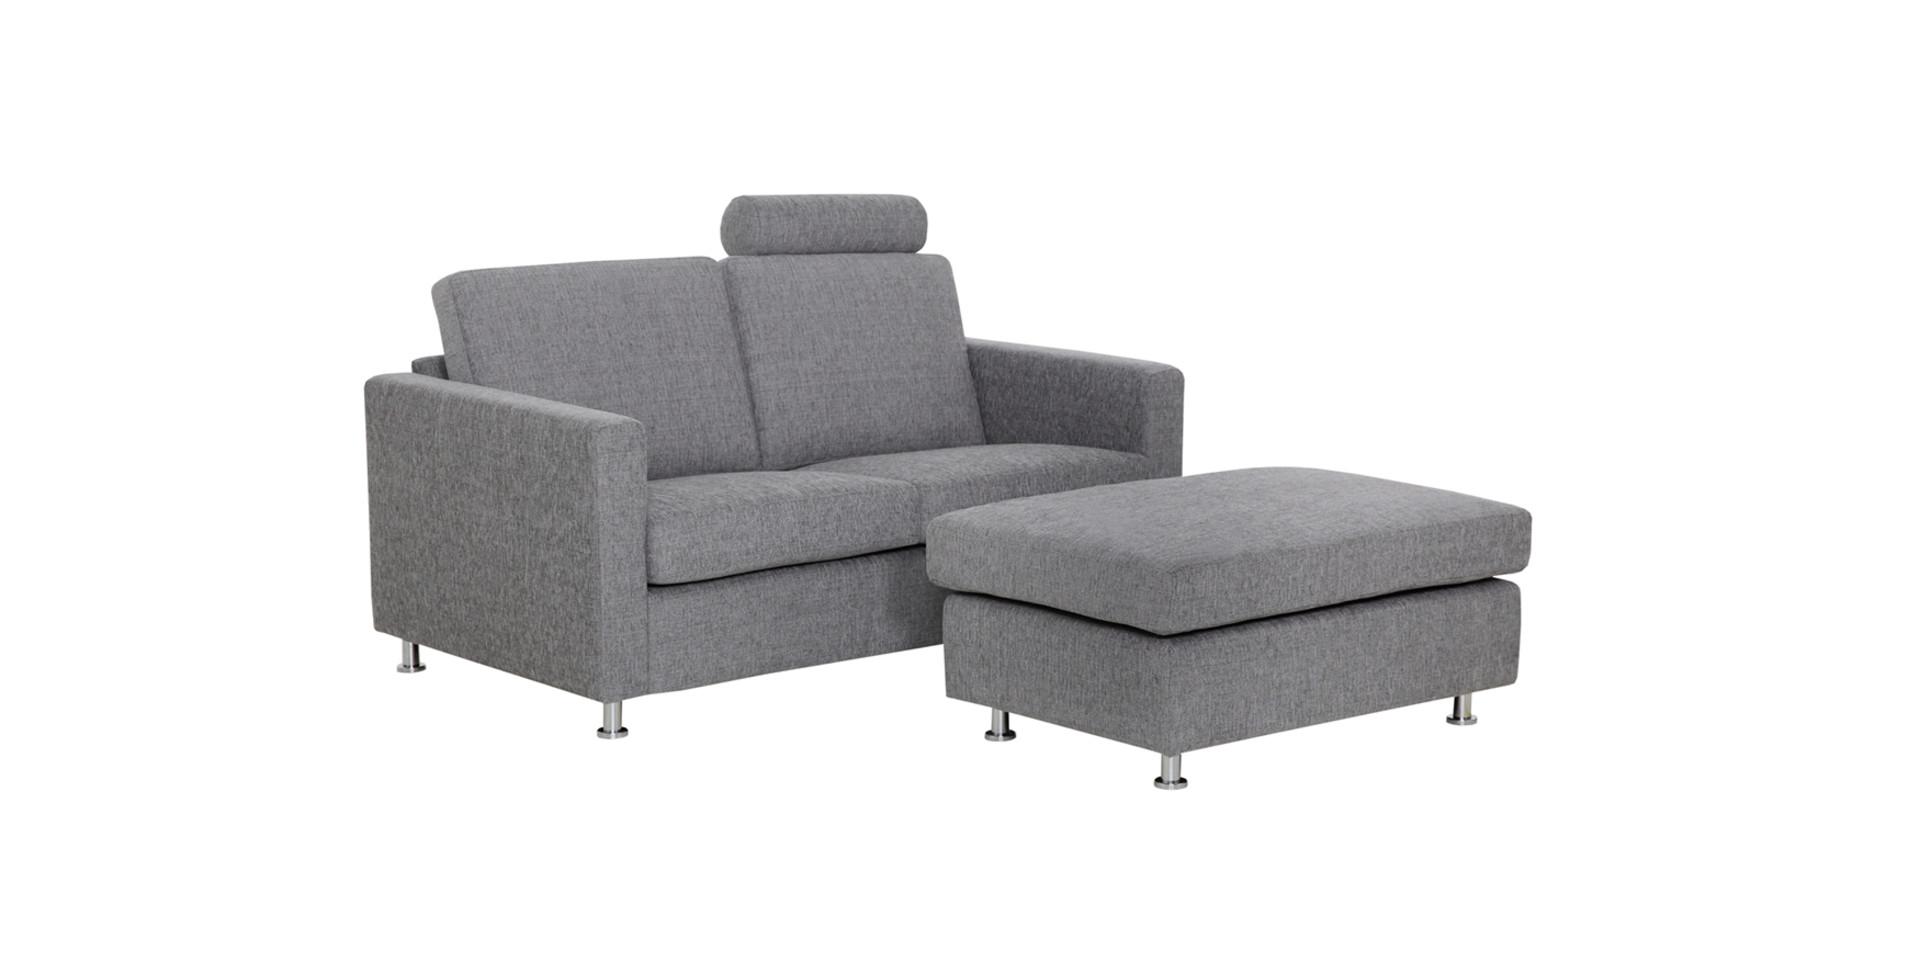 sits-palma-canape-pouf-2seater_footstool_headrest_veraam1c9grey_2